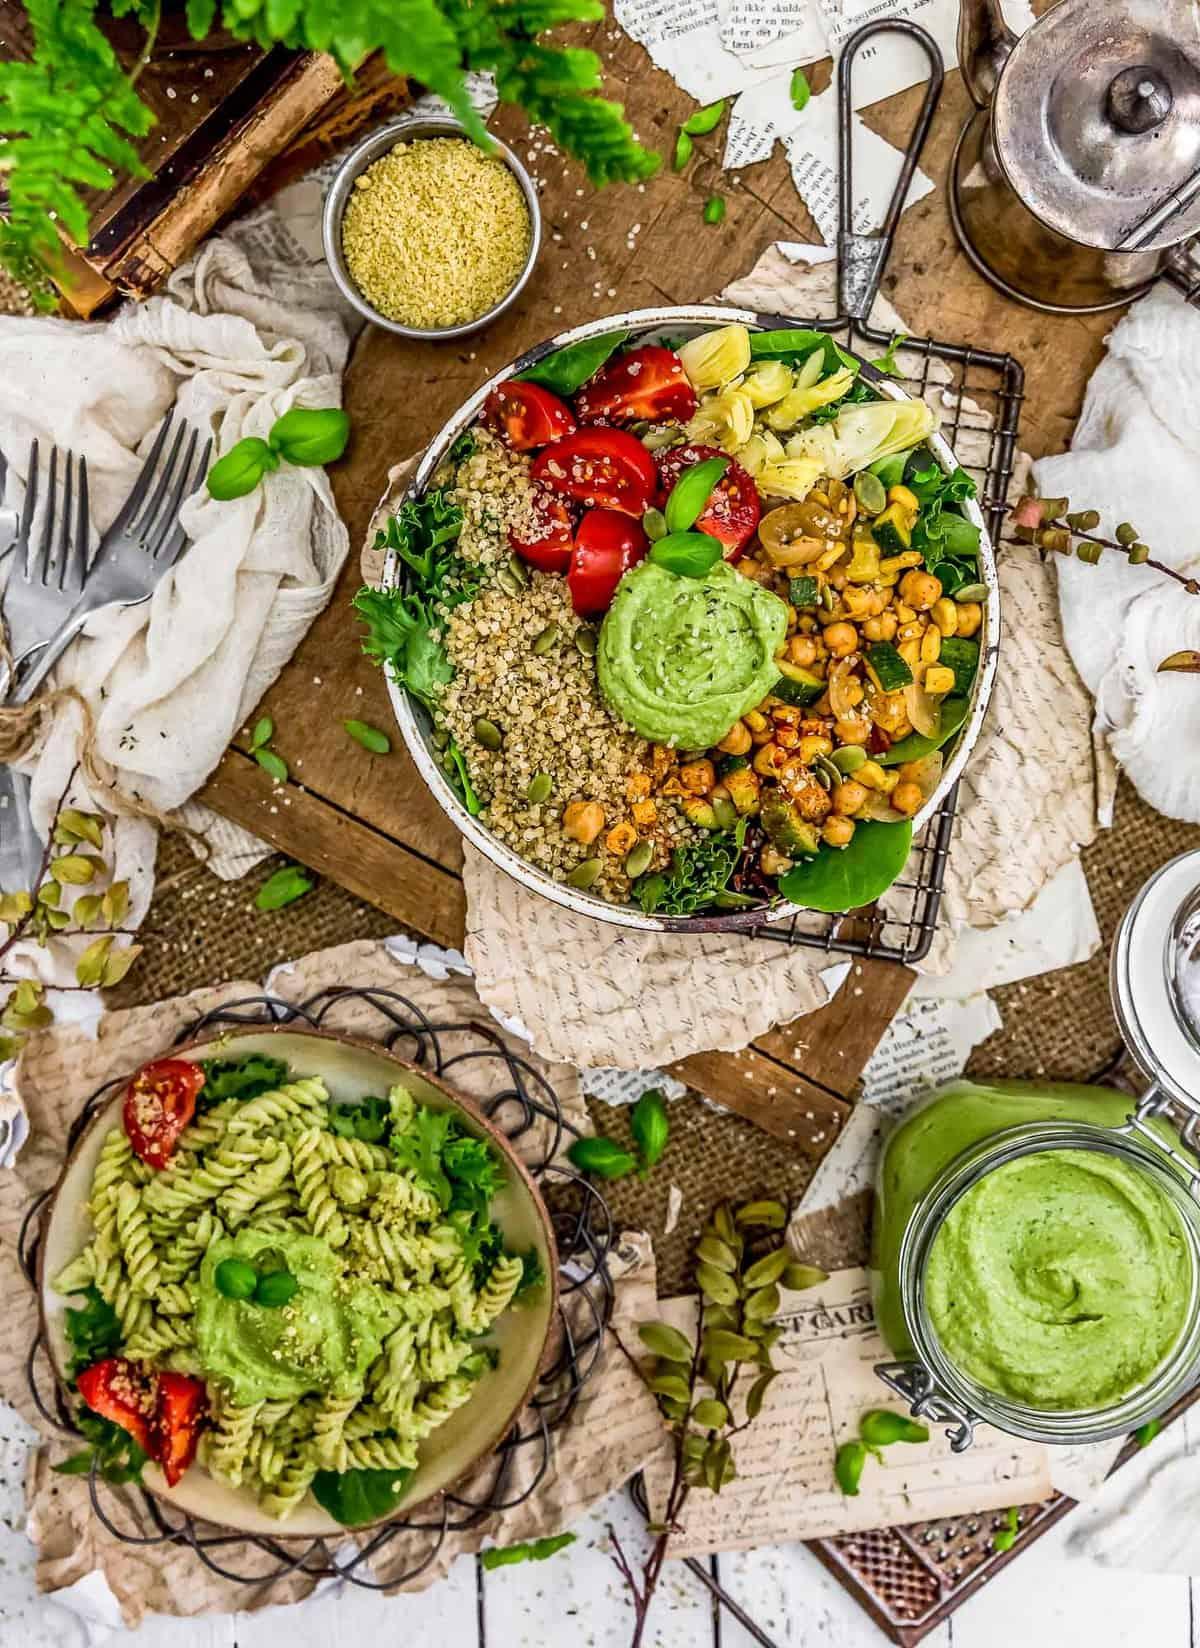 Tablescape of Vegan Oil Free Avocado Pesto